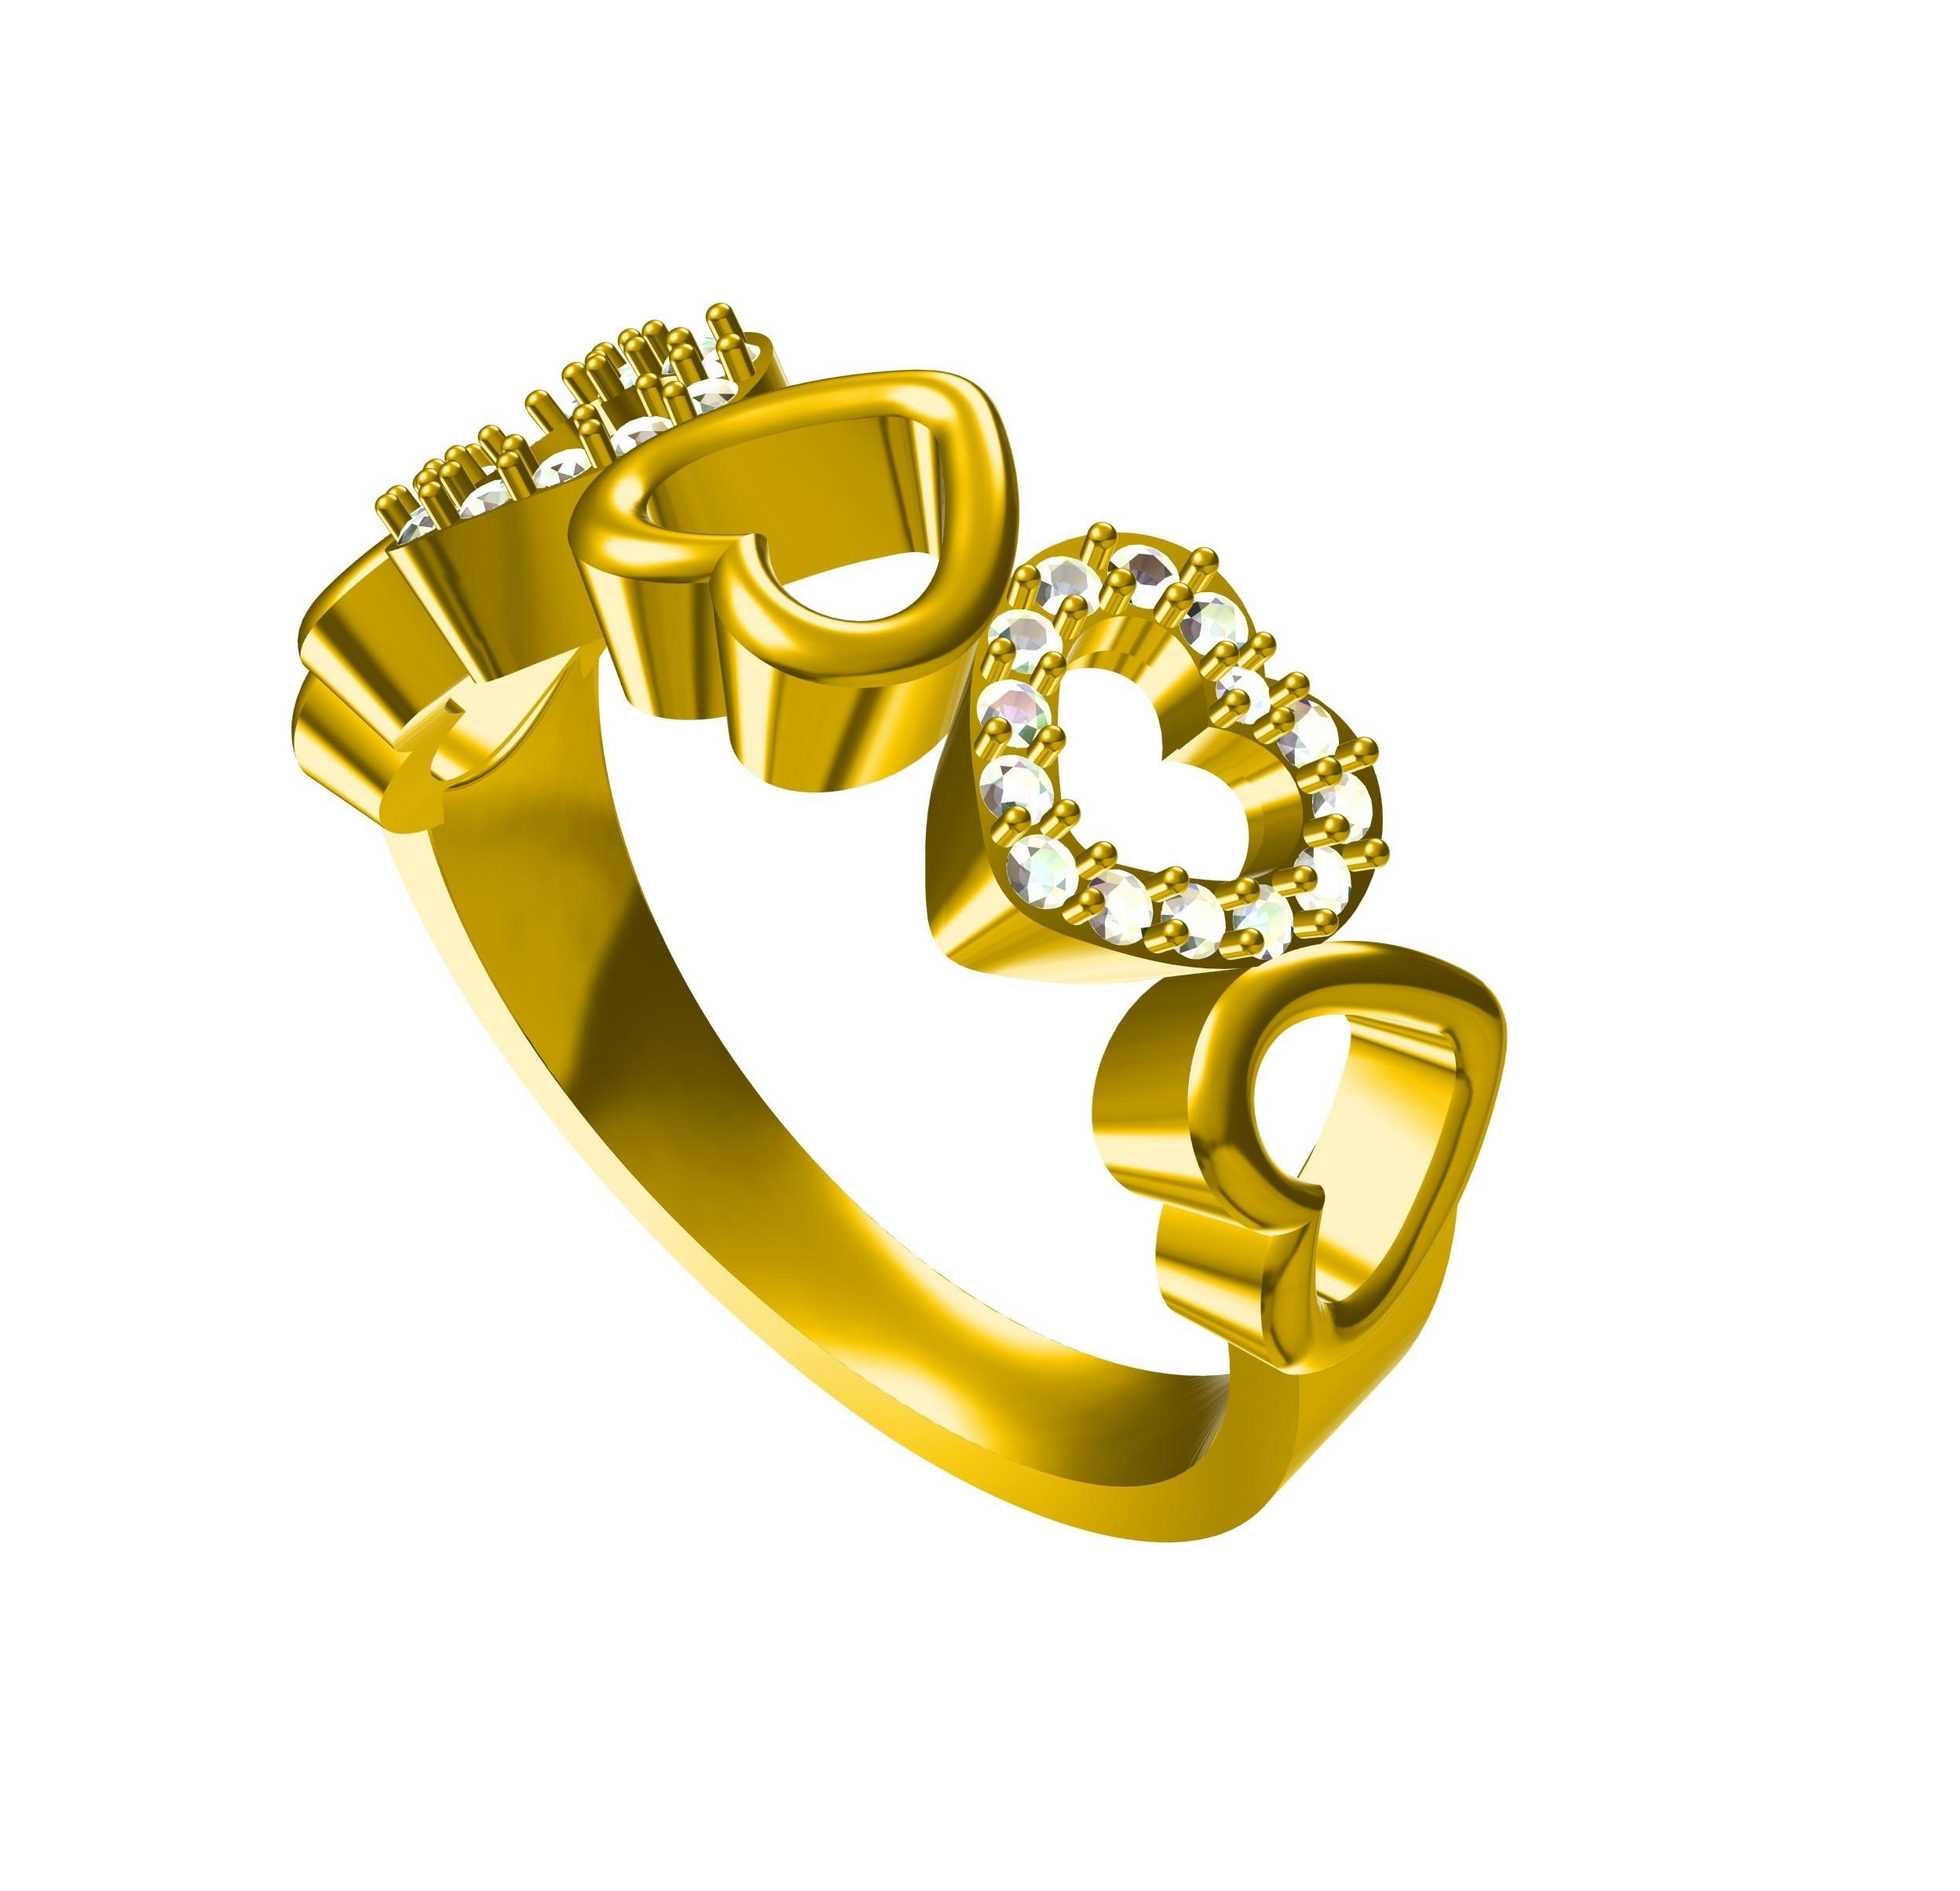 hert.jpg Download STL file 3D CAD Model For Beautiful Multi Heart Design Ring • 3D printer model, VR3D